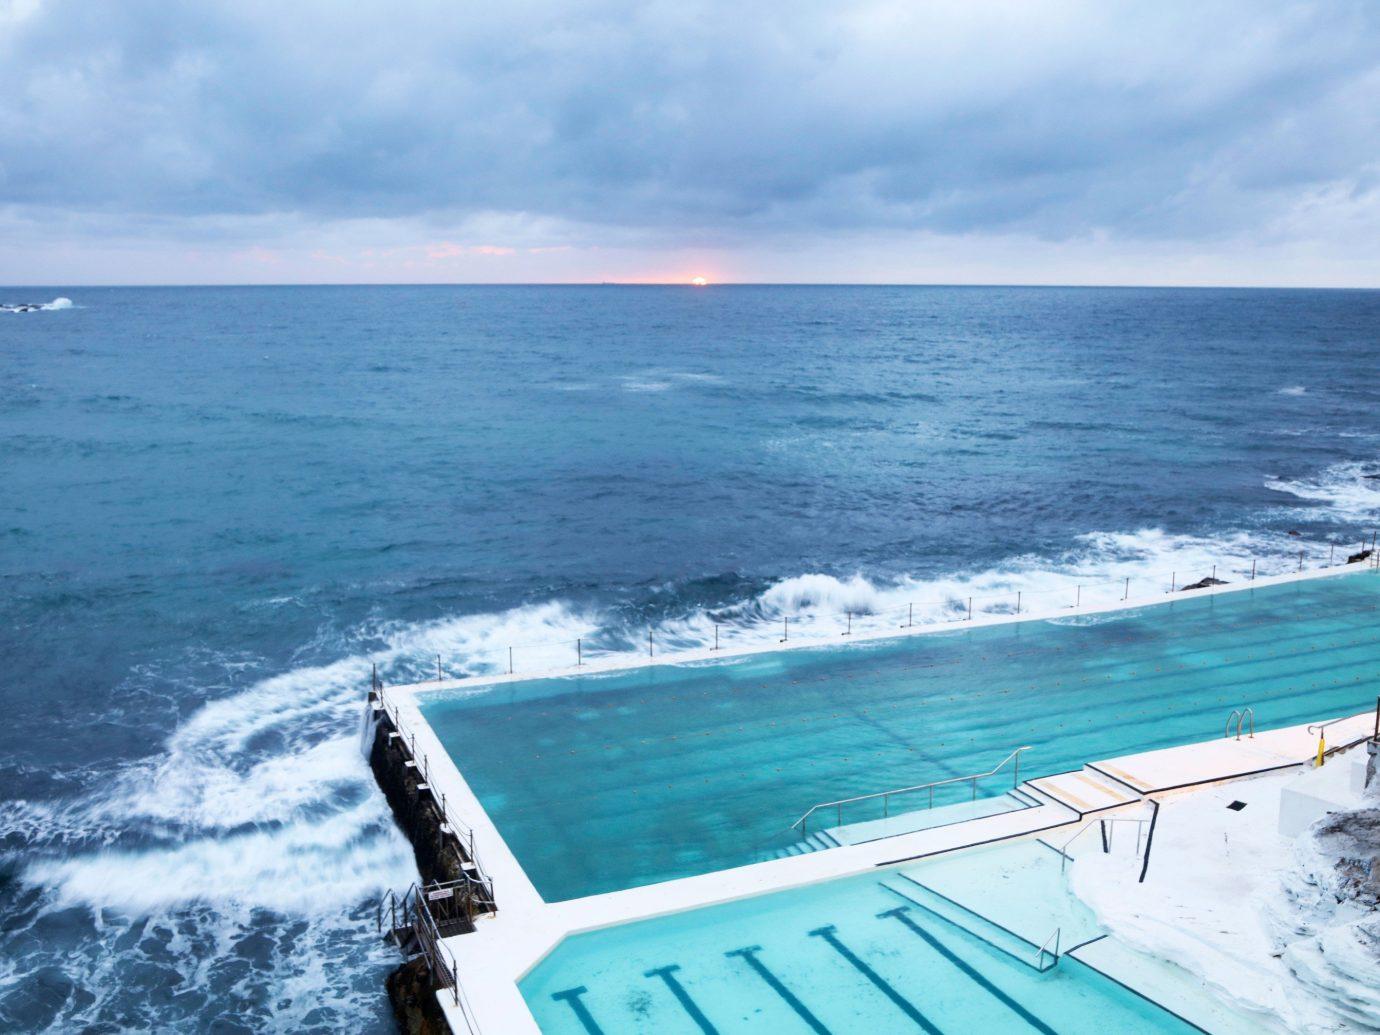 Offbeat water sky outdoor Sea Ocean horizon caribbean vacation wind wave vehicle Coast shore cape wave